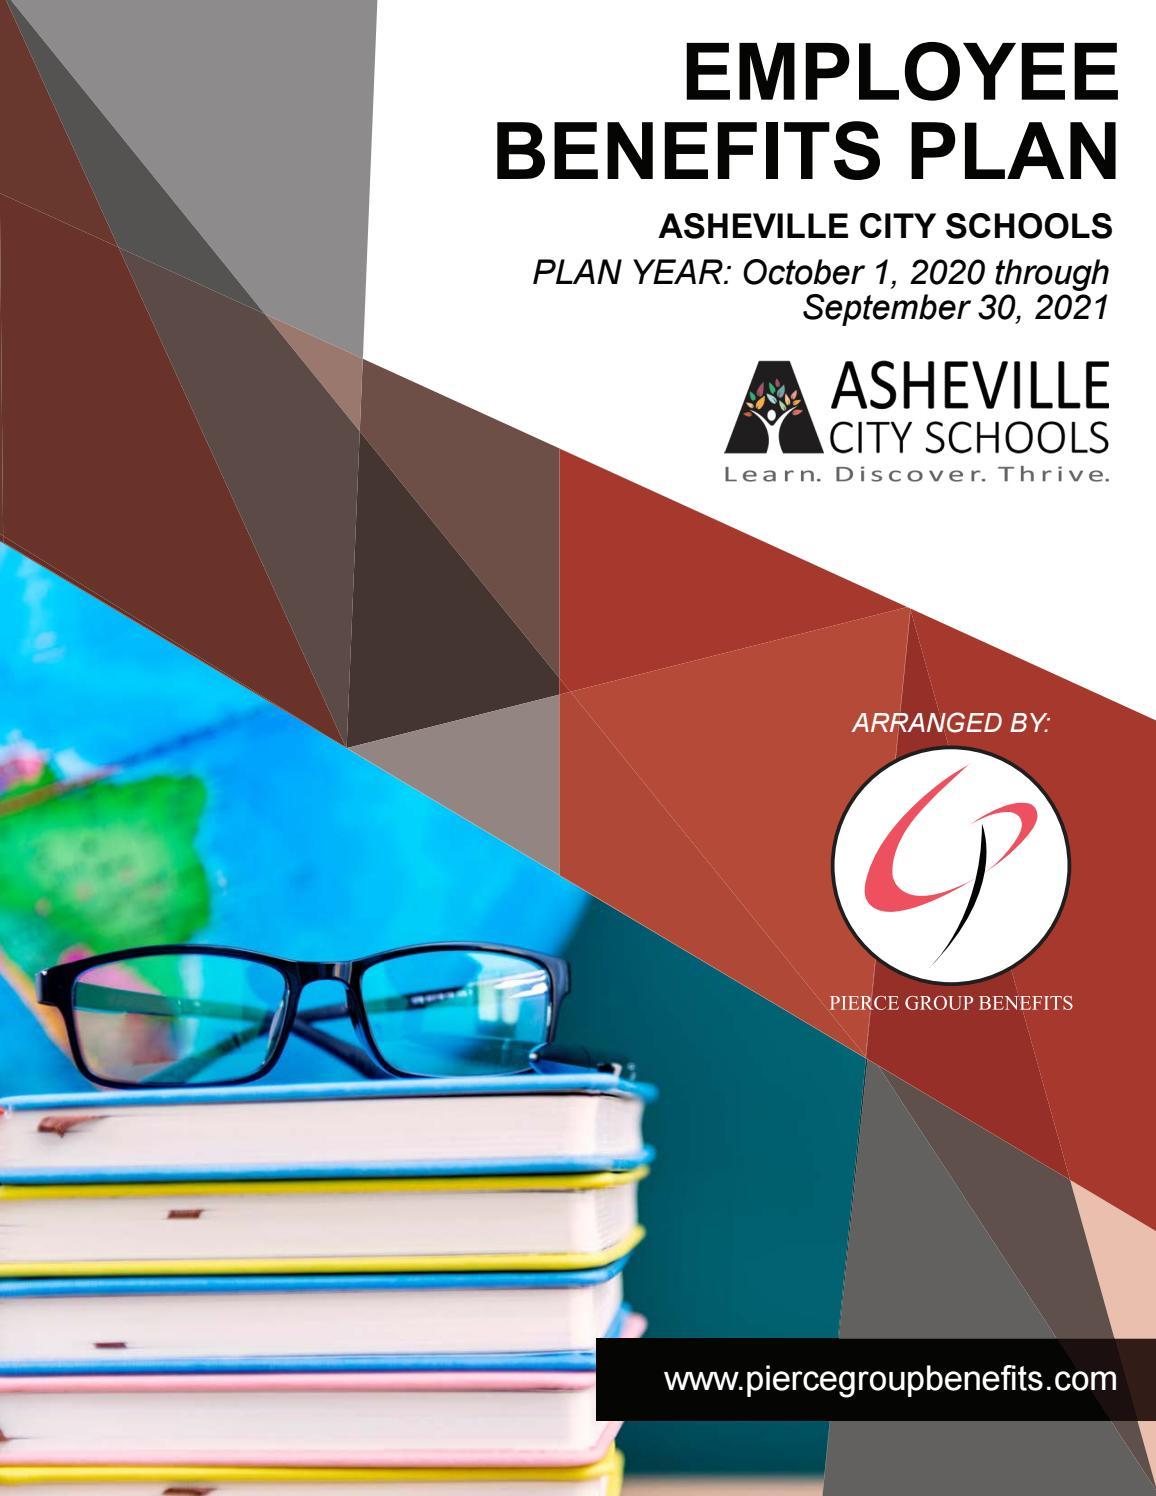 asheville city schools benefits booklet 2020 by Pierce Group